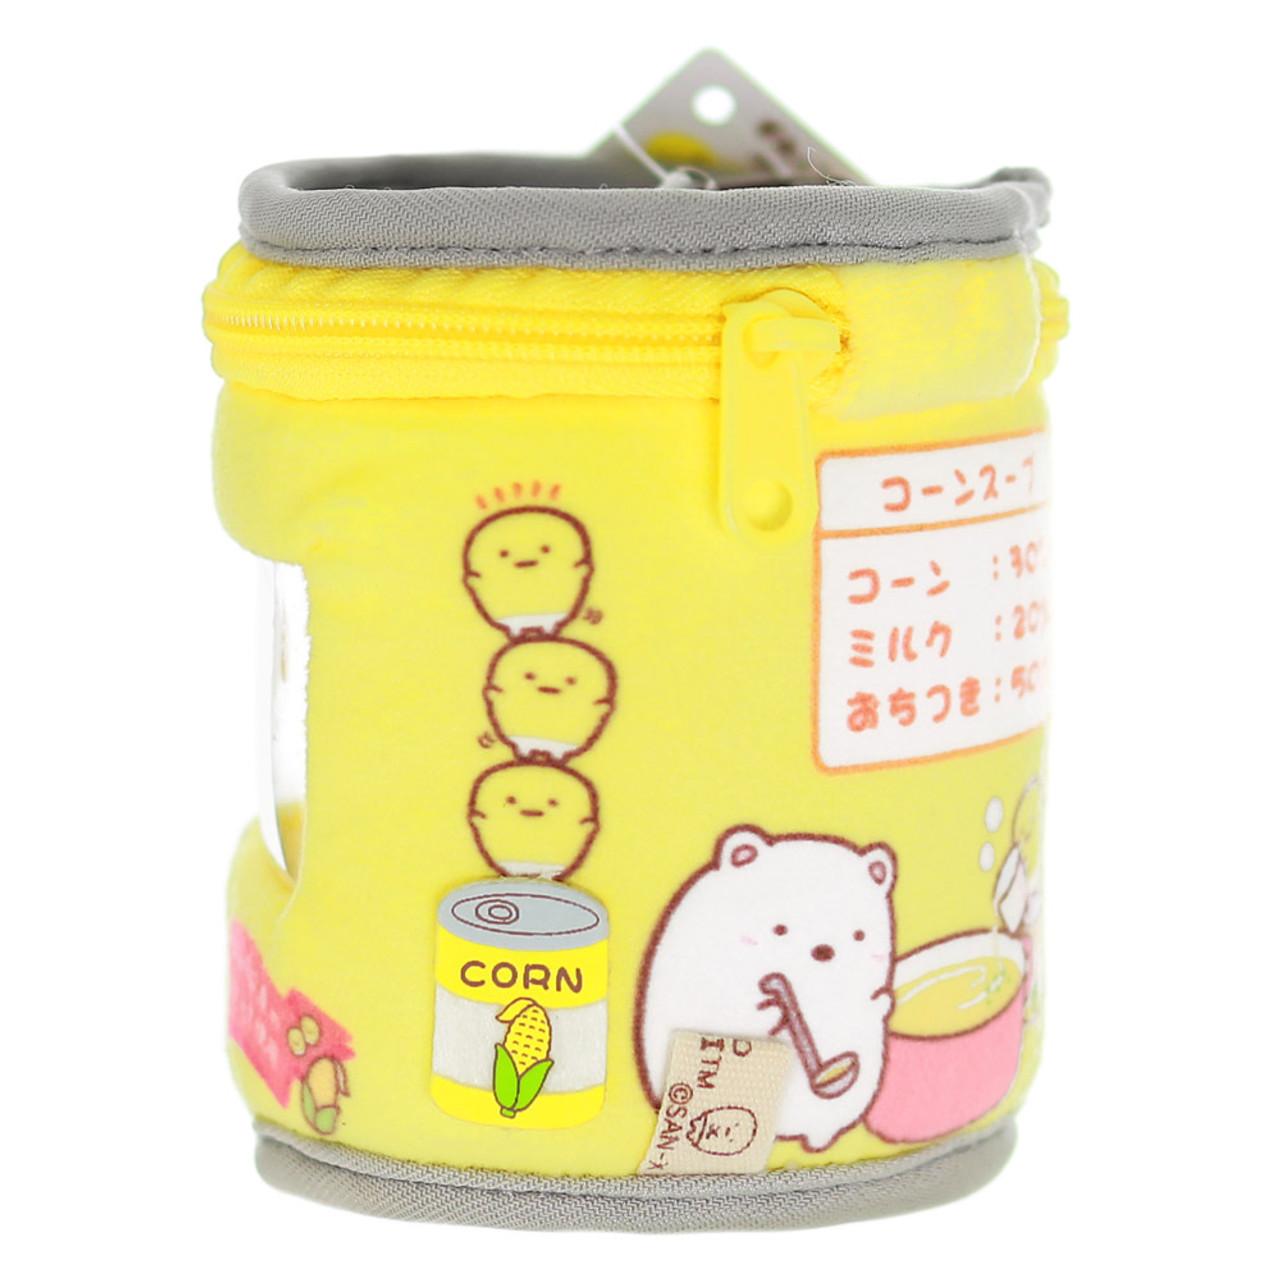 Sumikko Gurashi Premium Corn Can Plush keychain Charm ( Side View )